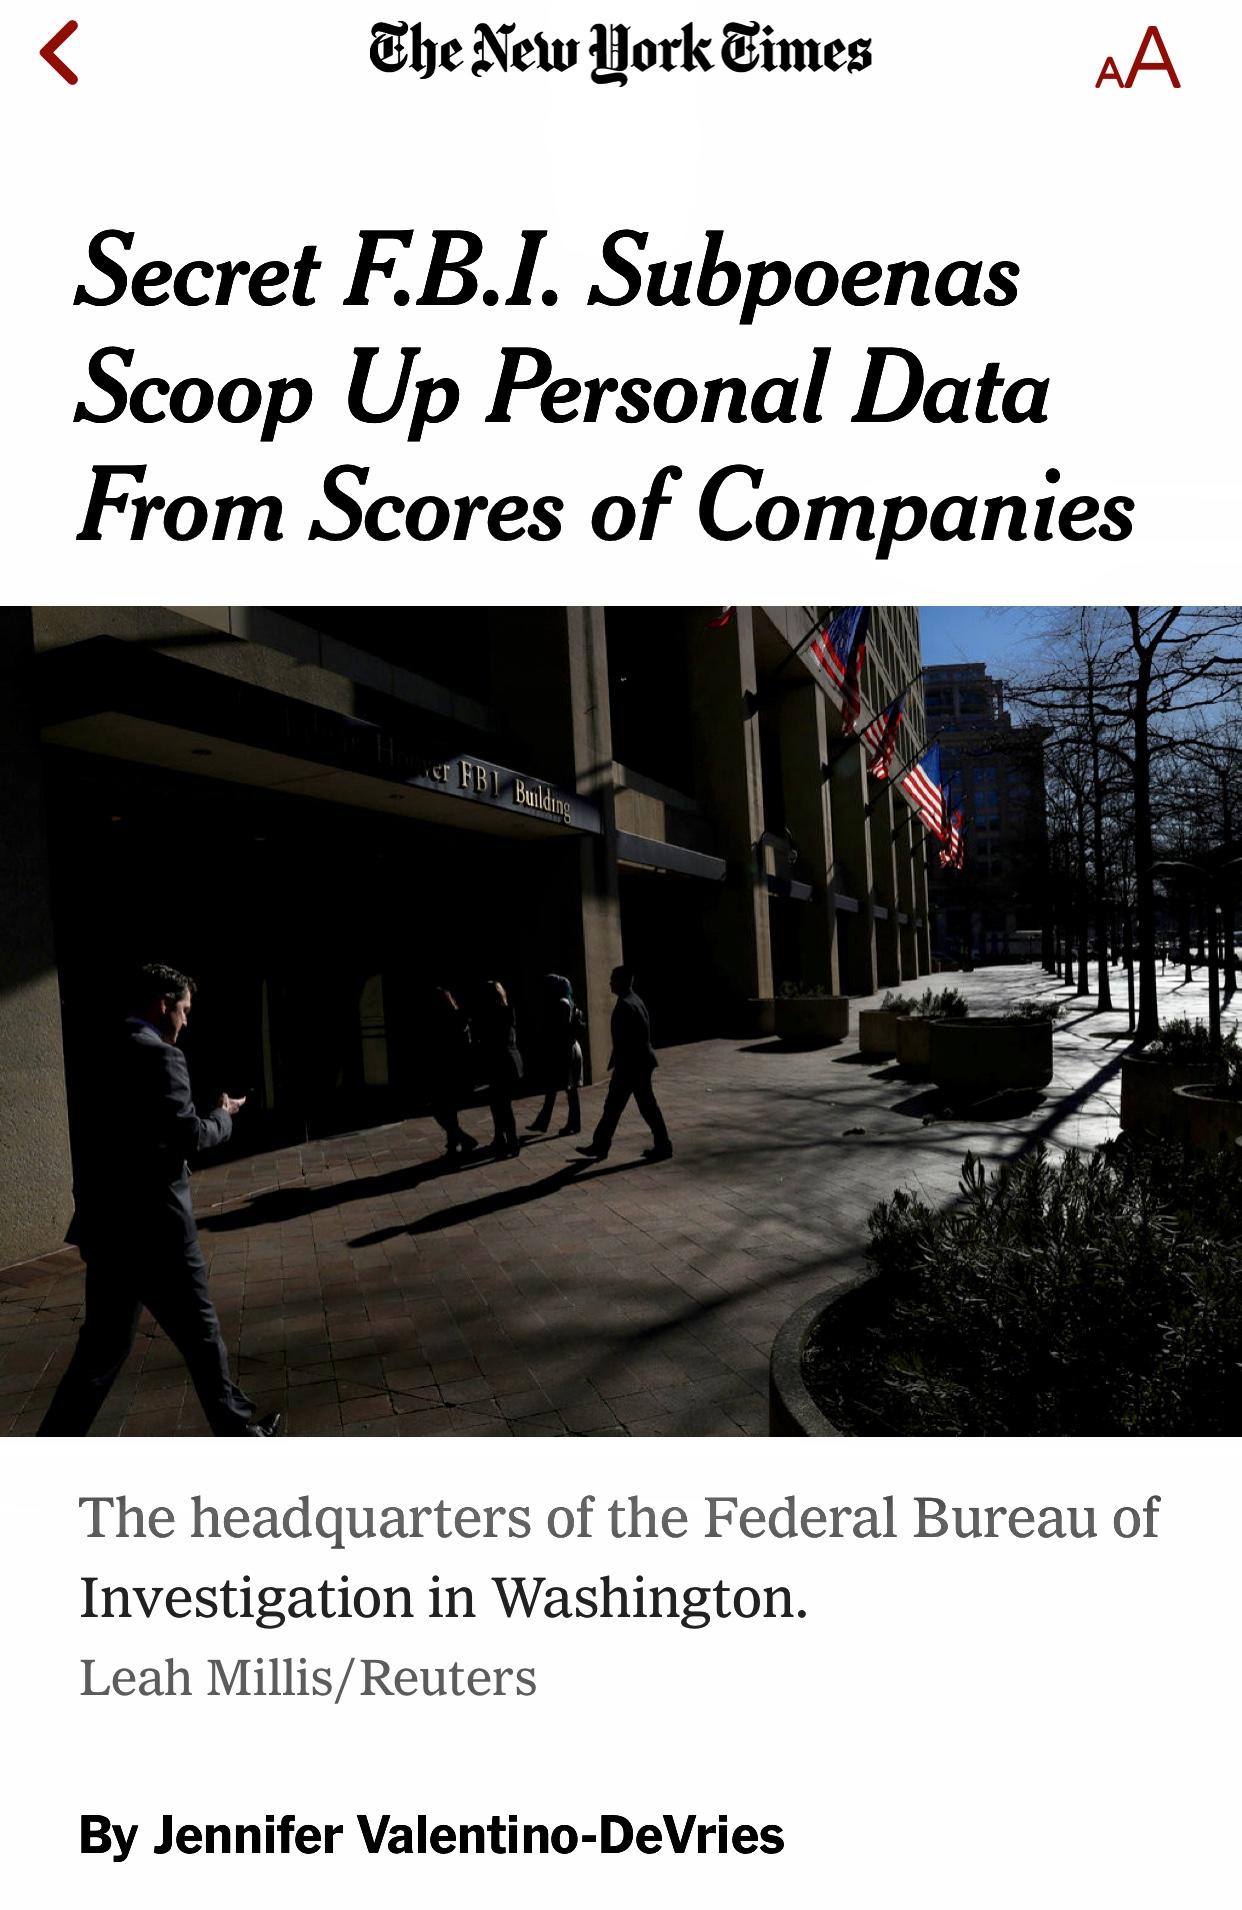 Secret FBI Subpoenas Scoop Up Personal Data From Scores of Companies